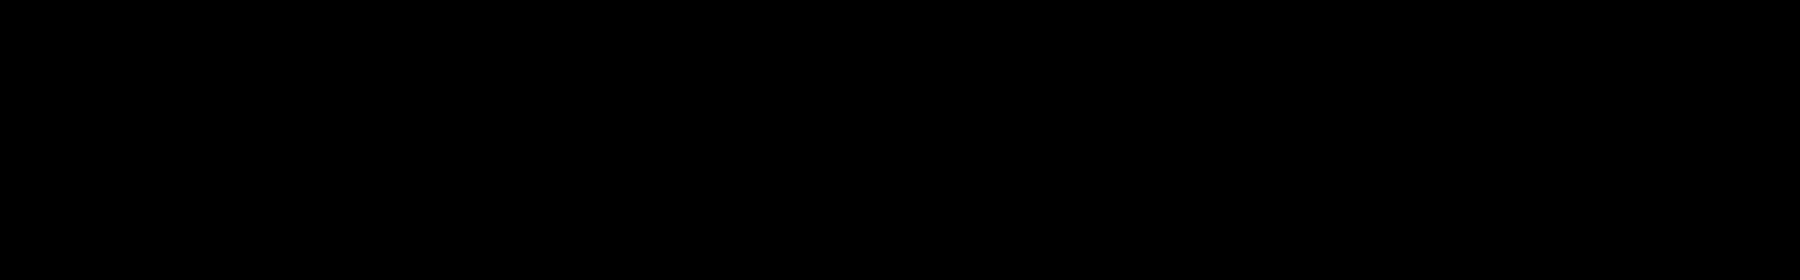 THE VOID audio waveform